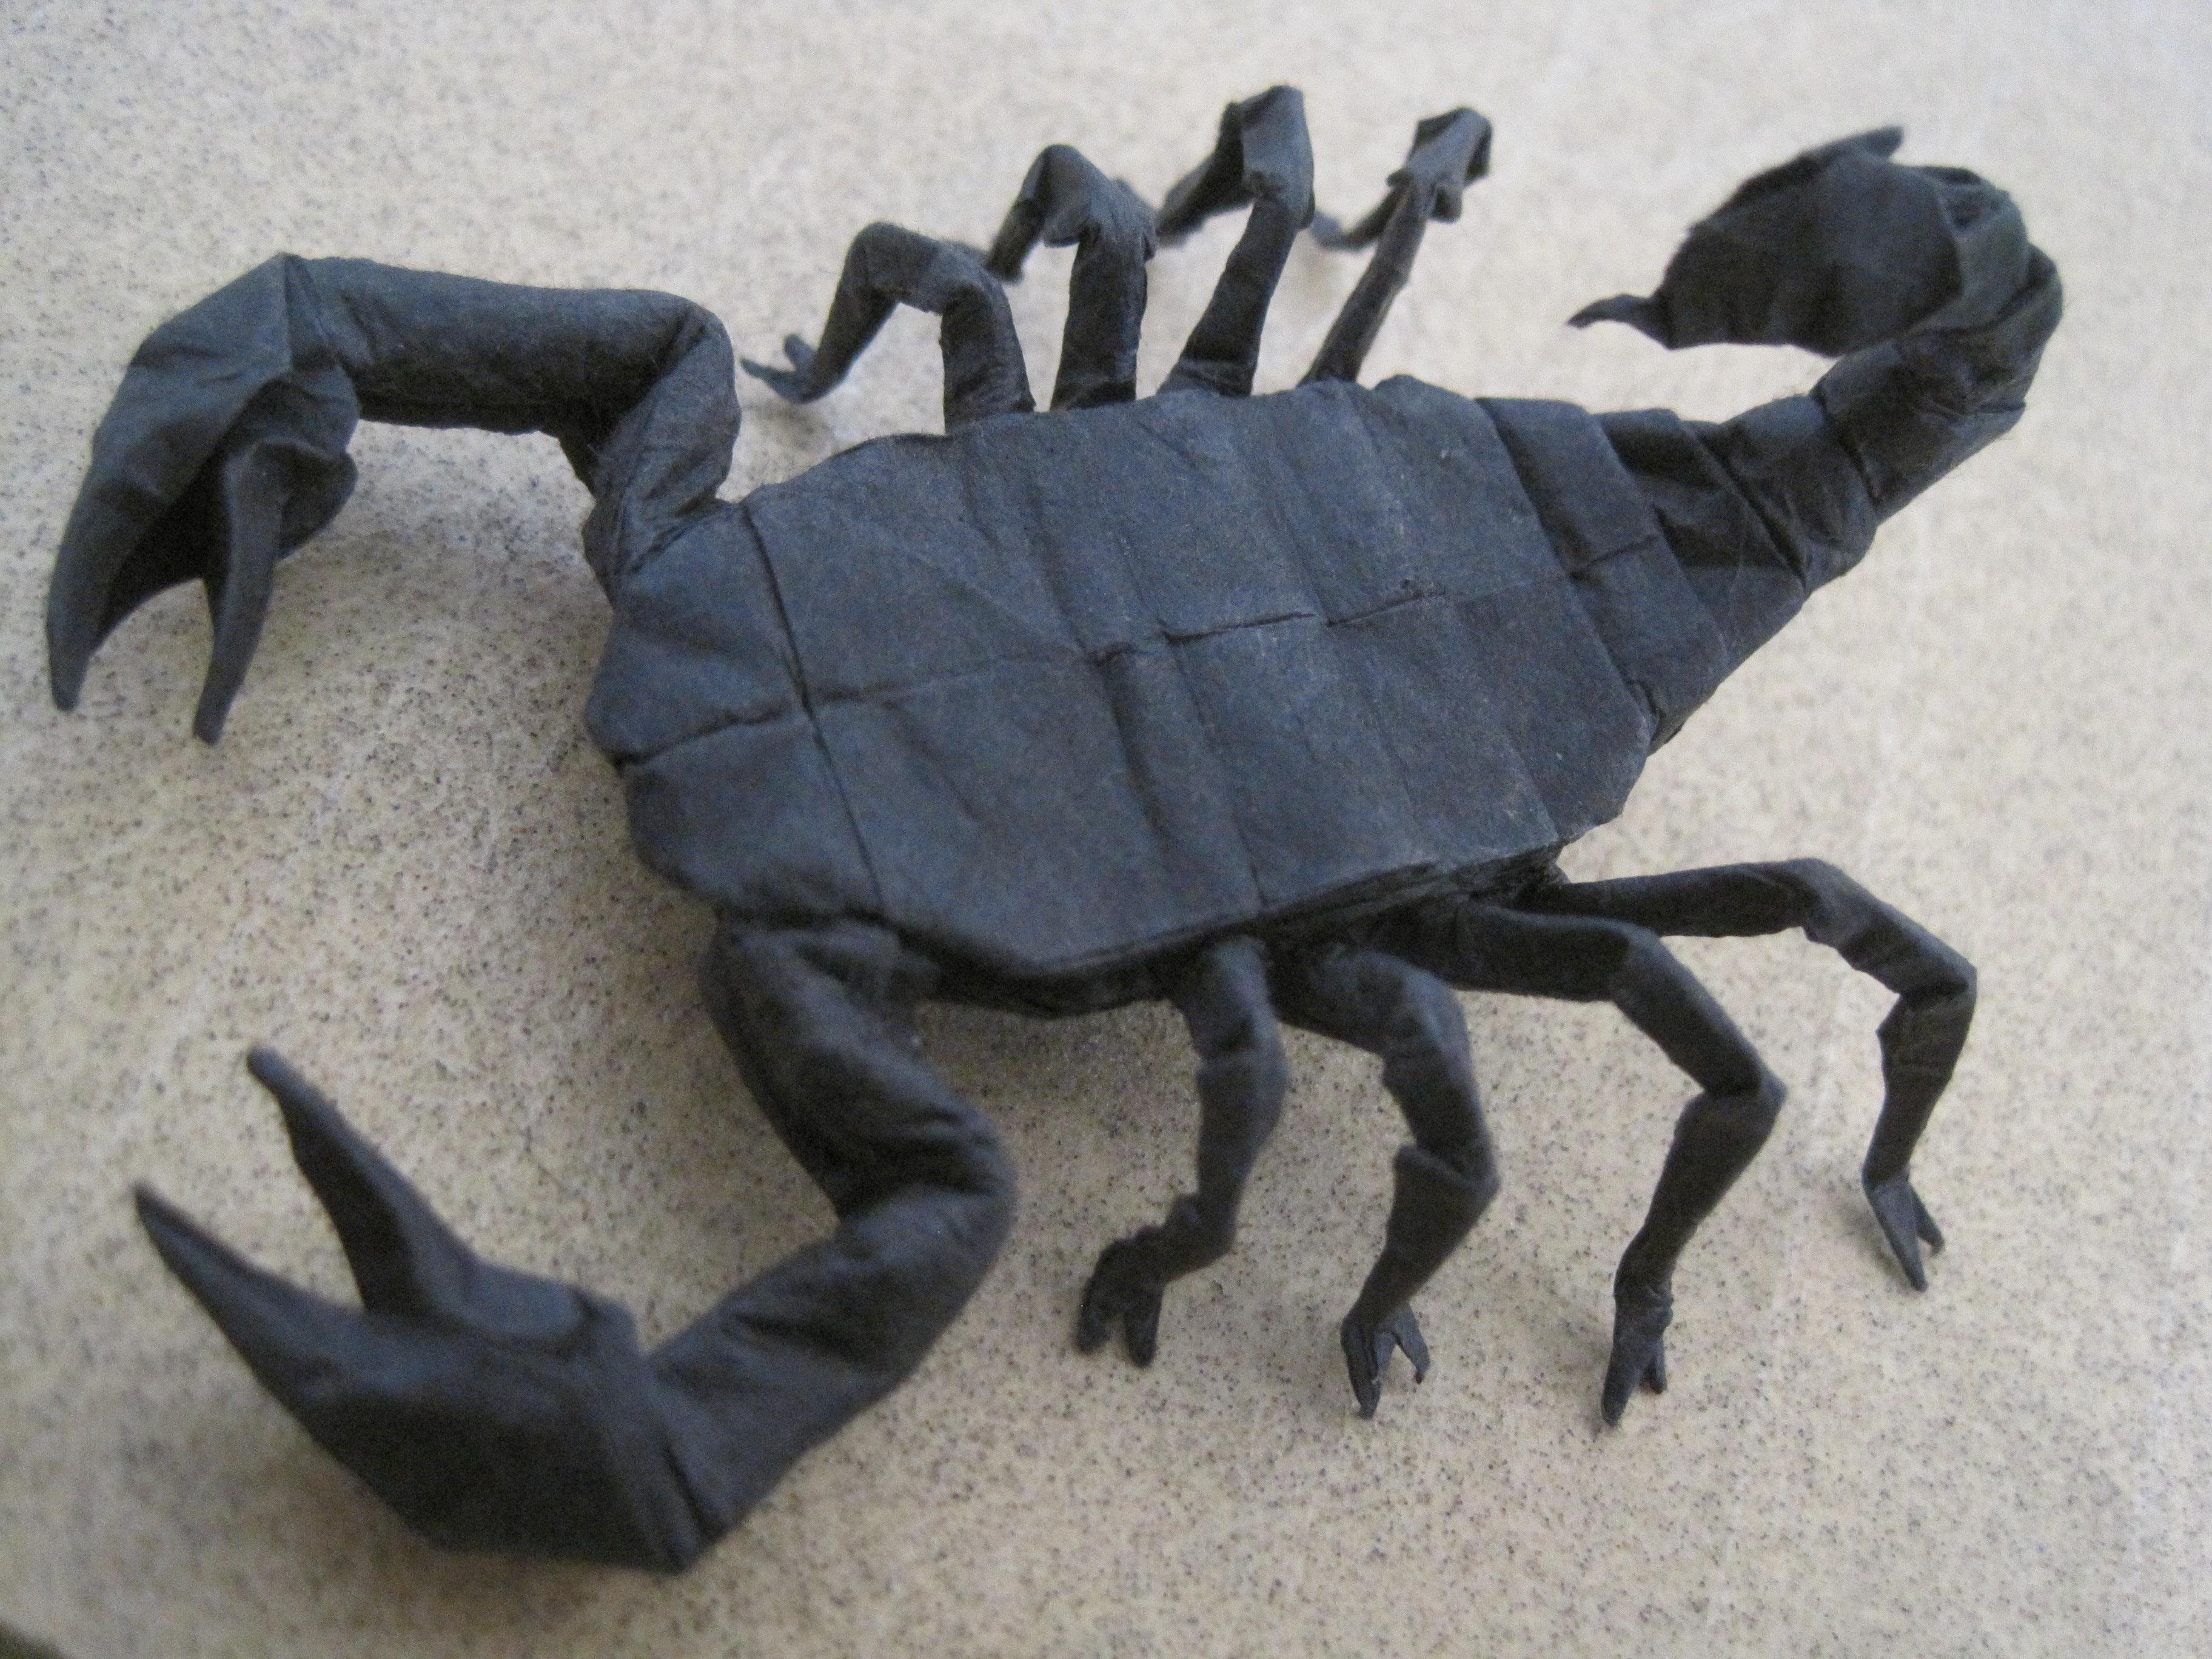 Origami Scorpion By Timsorigami On Deviantart Rh Com Diagrams Lang Robert J Diagram